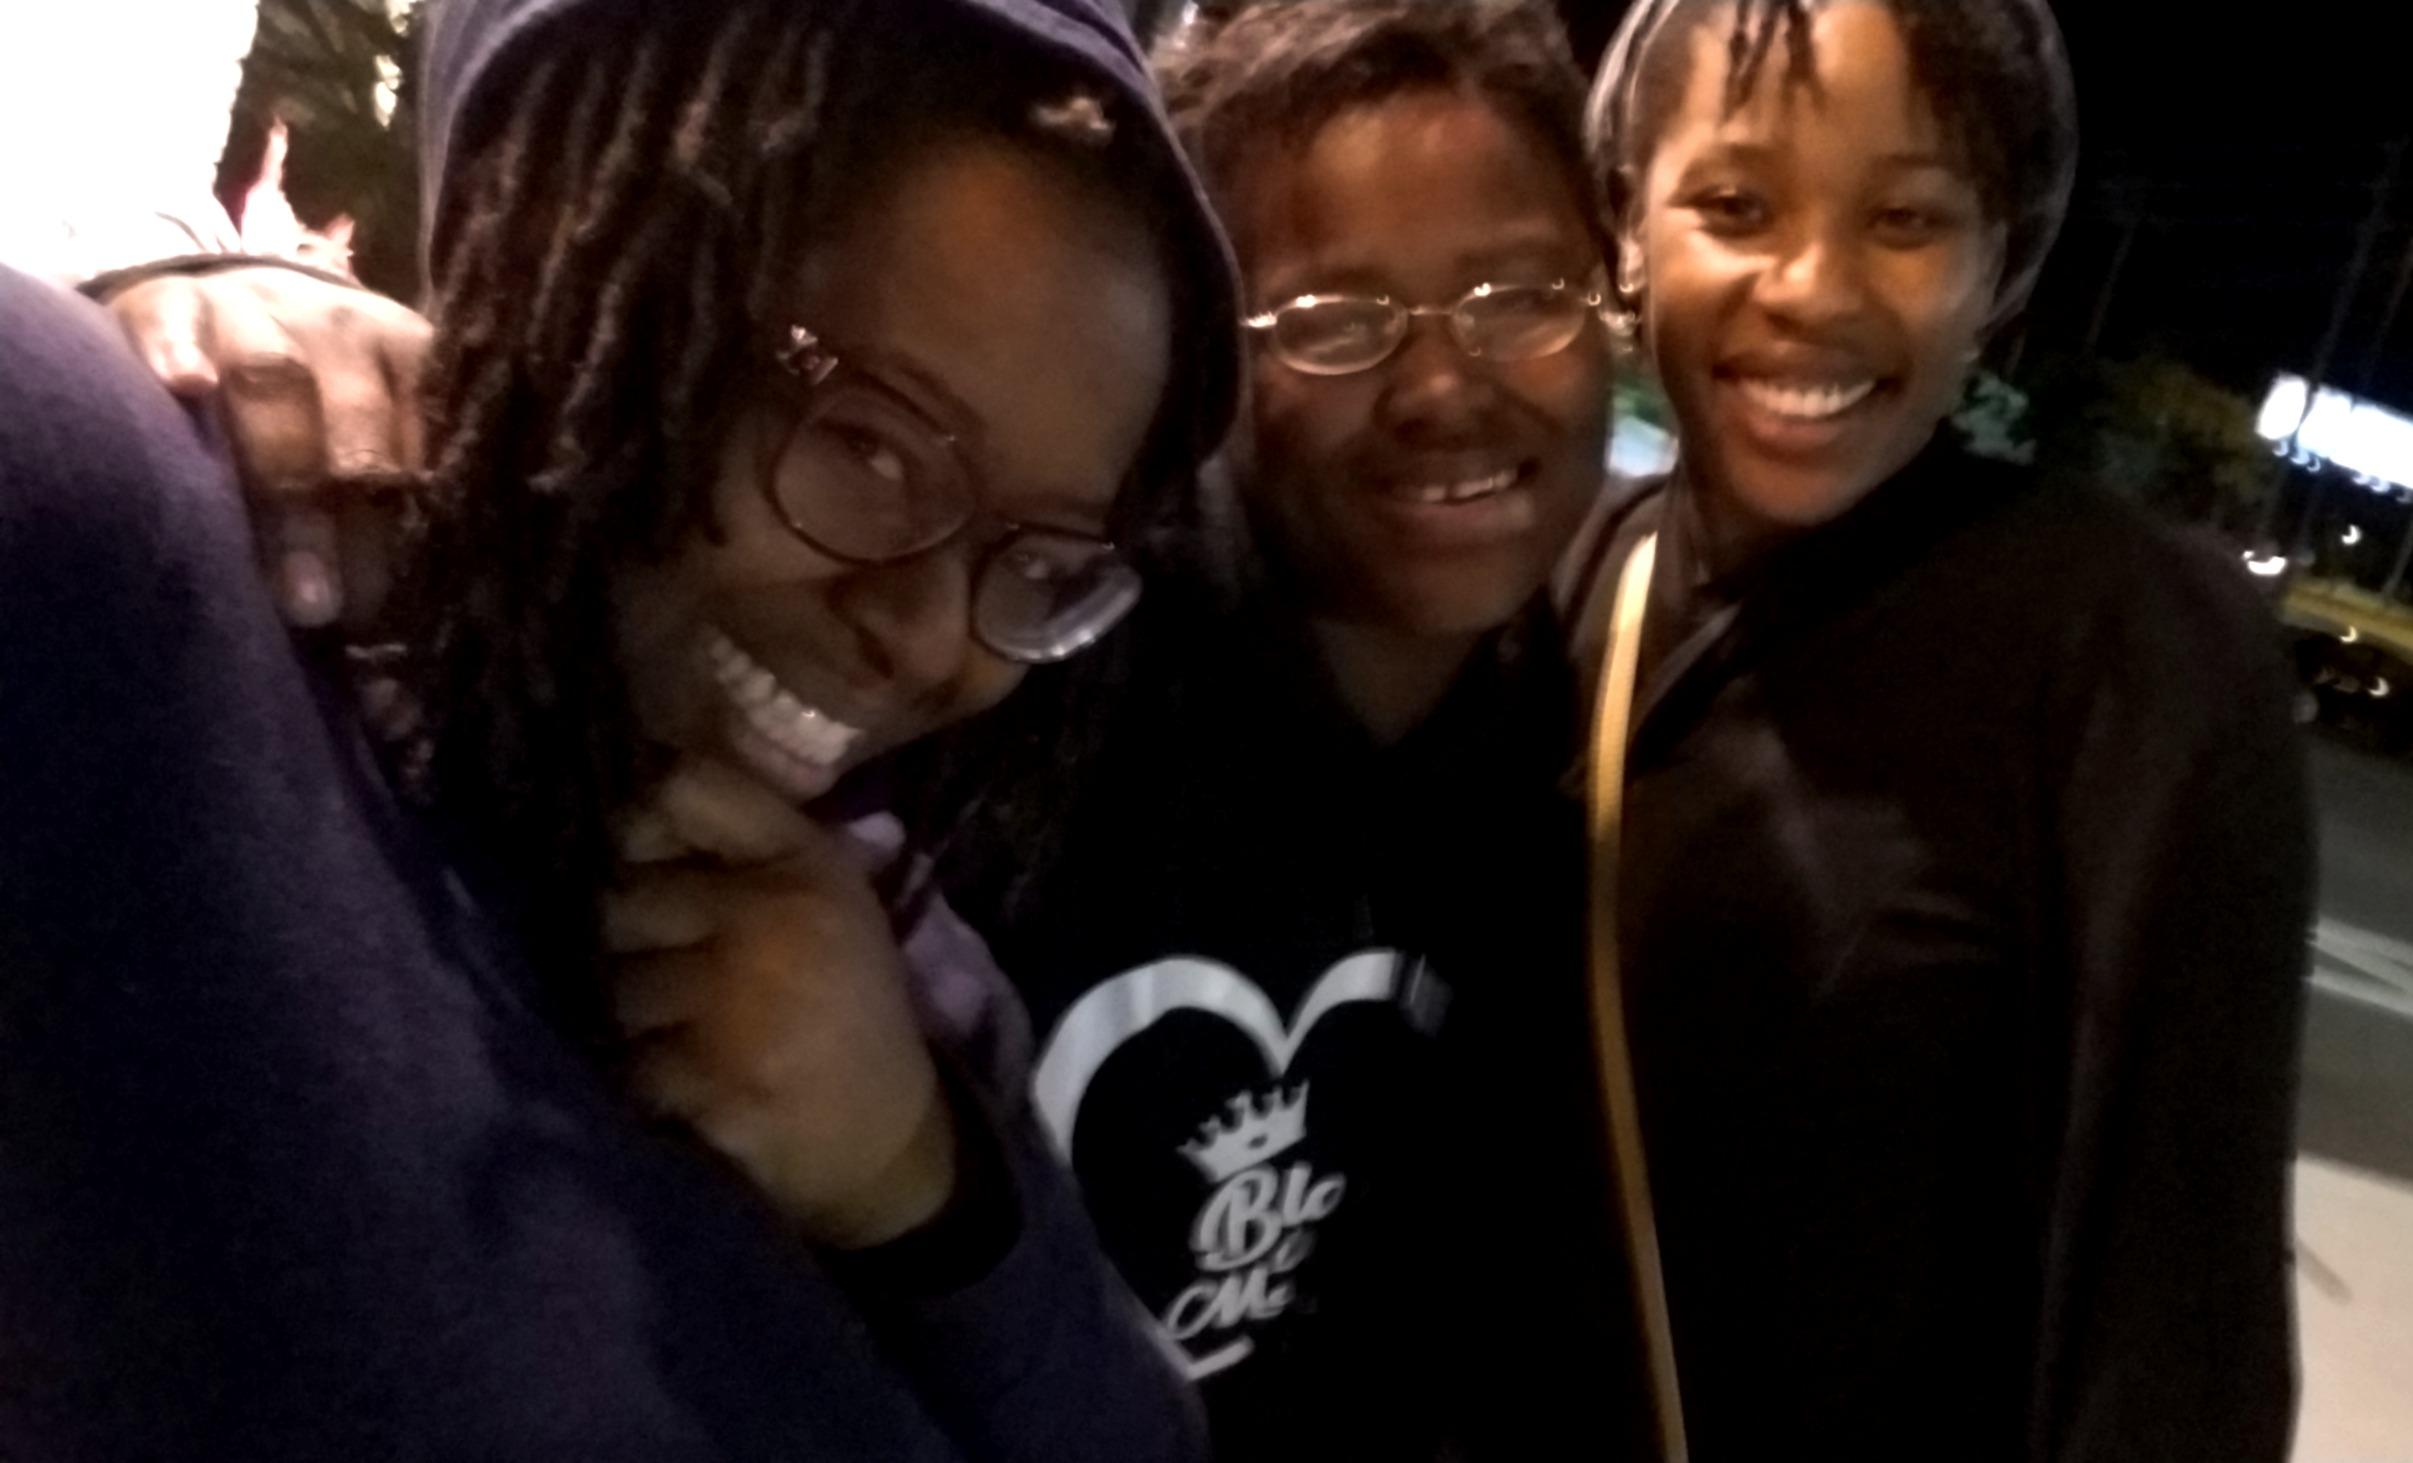 Celebrating One Another = Sisterhood